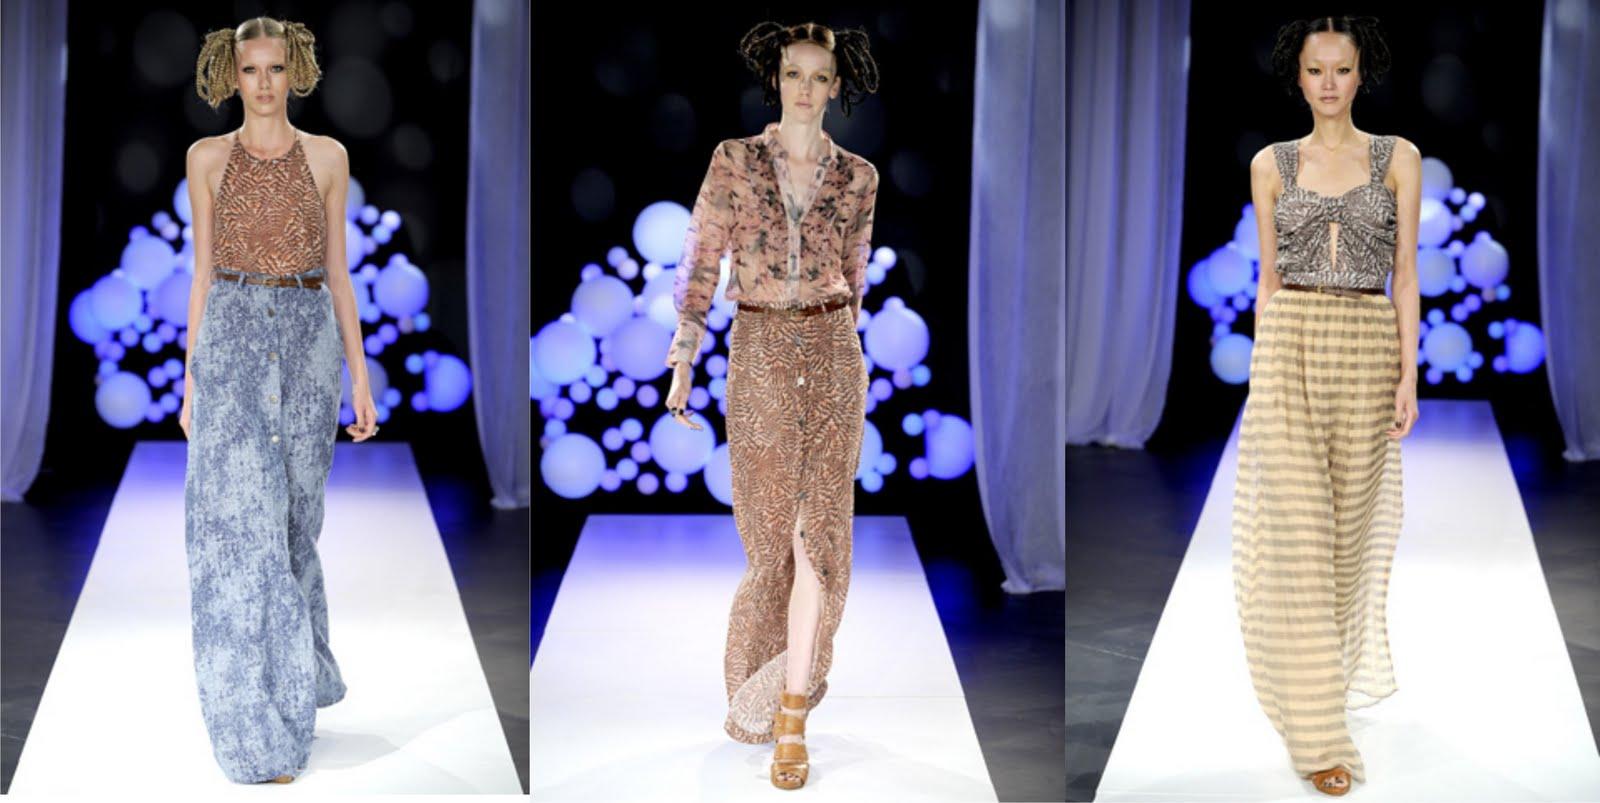 Julián Arquez: New York Fashion Week: Day 1